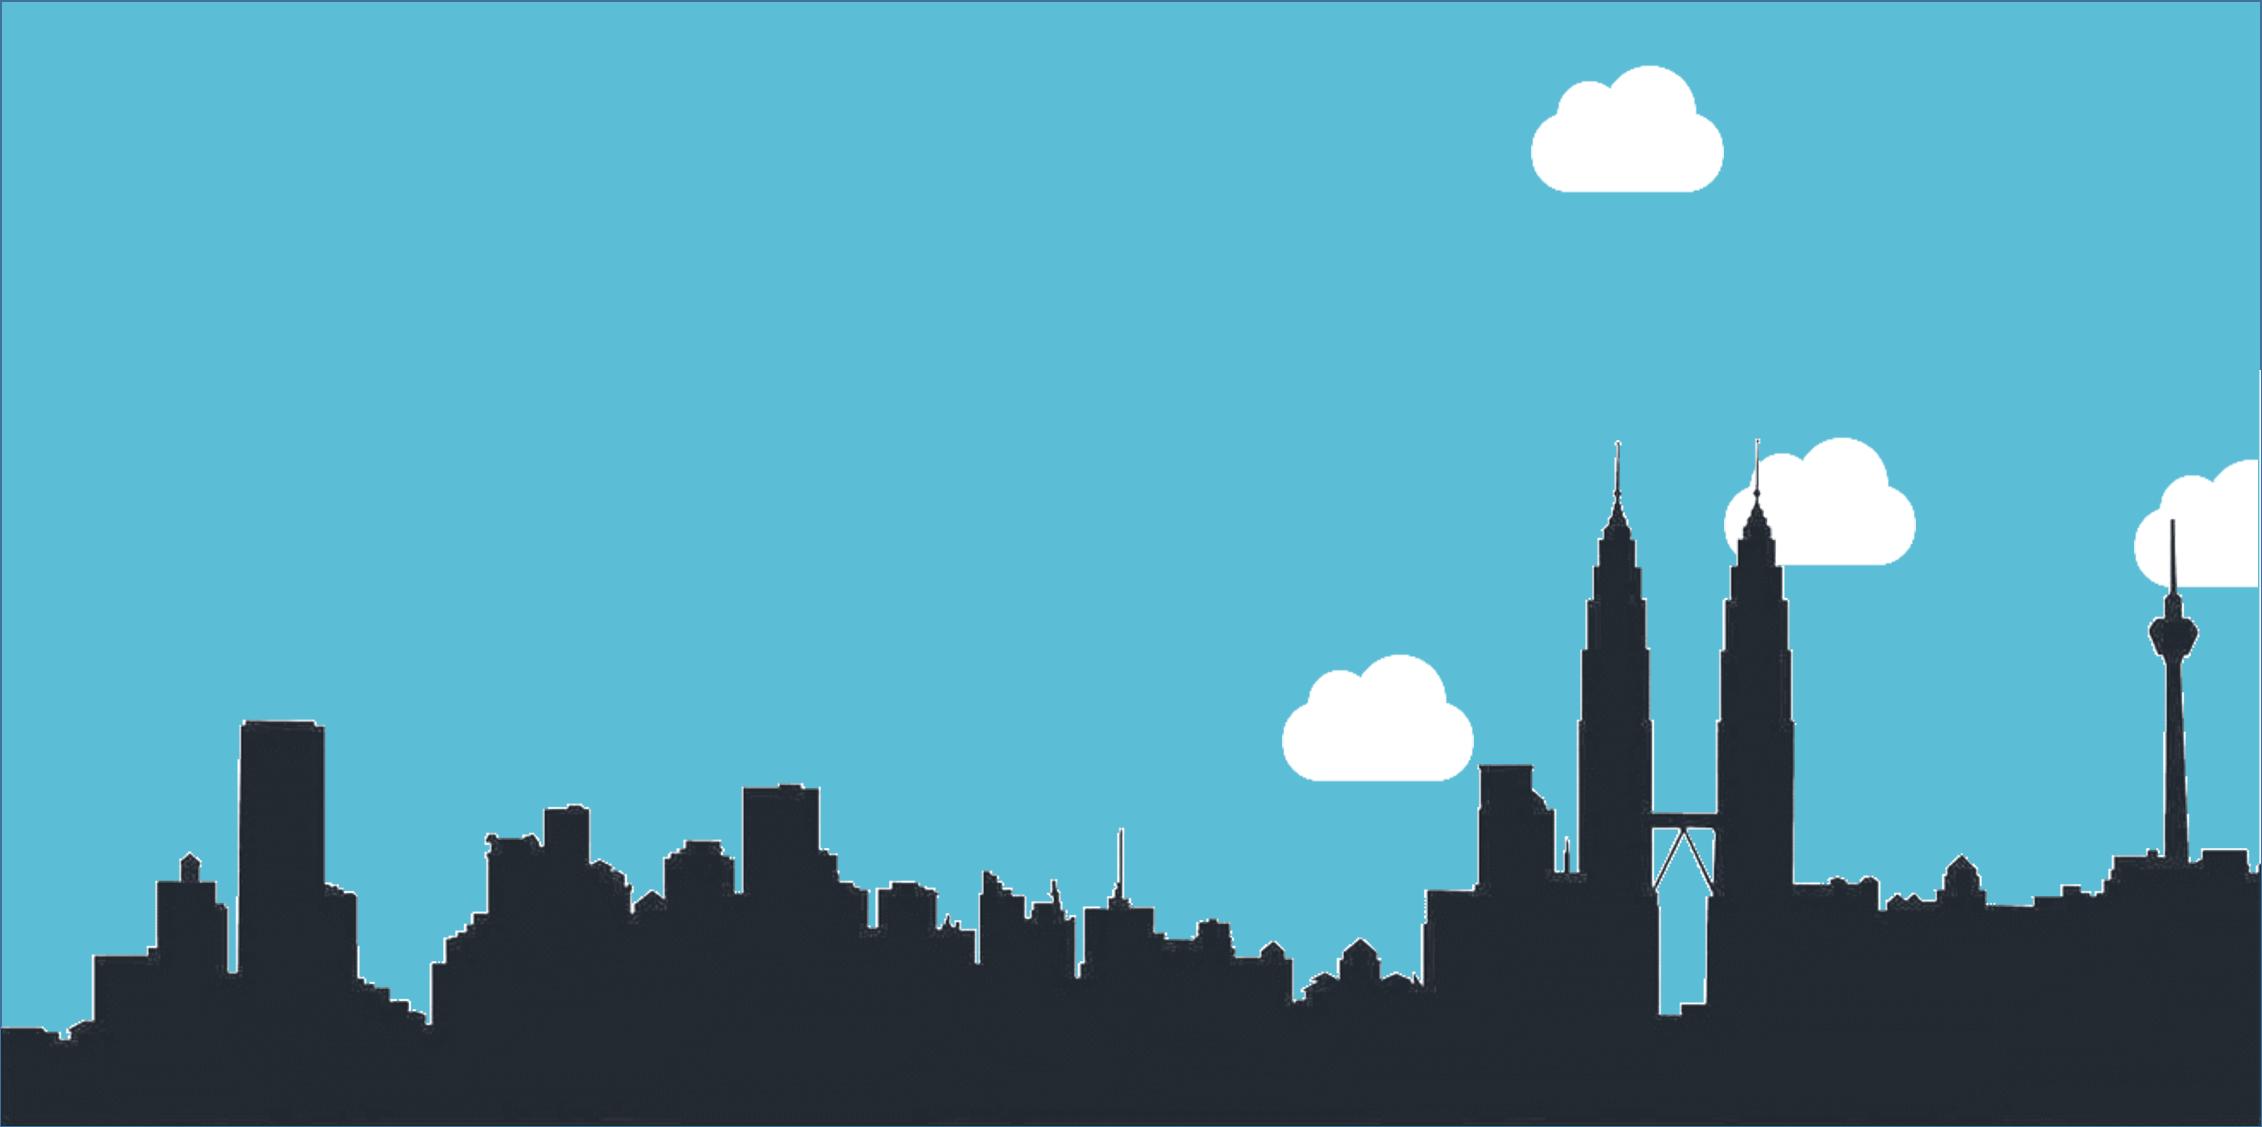 kl-skyline-graphic